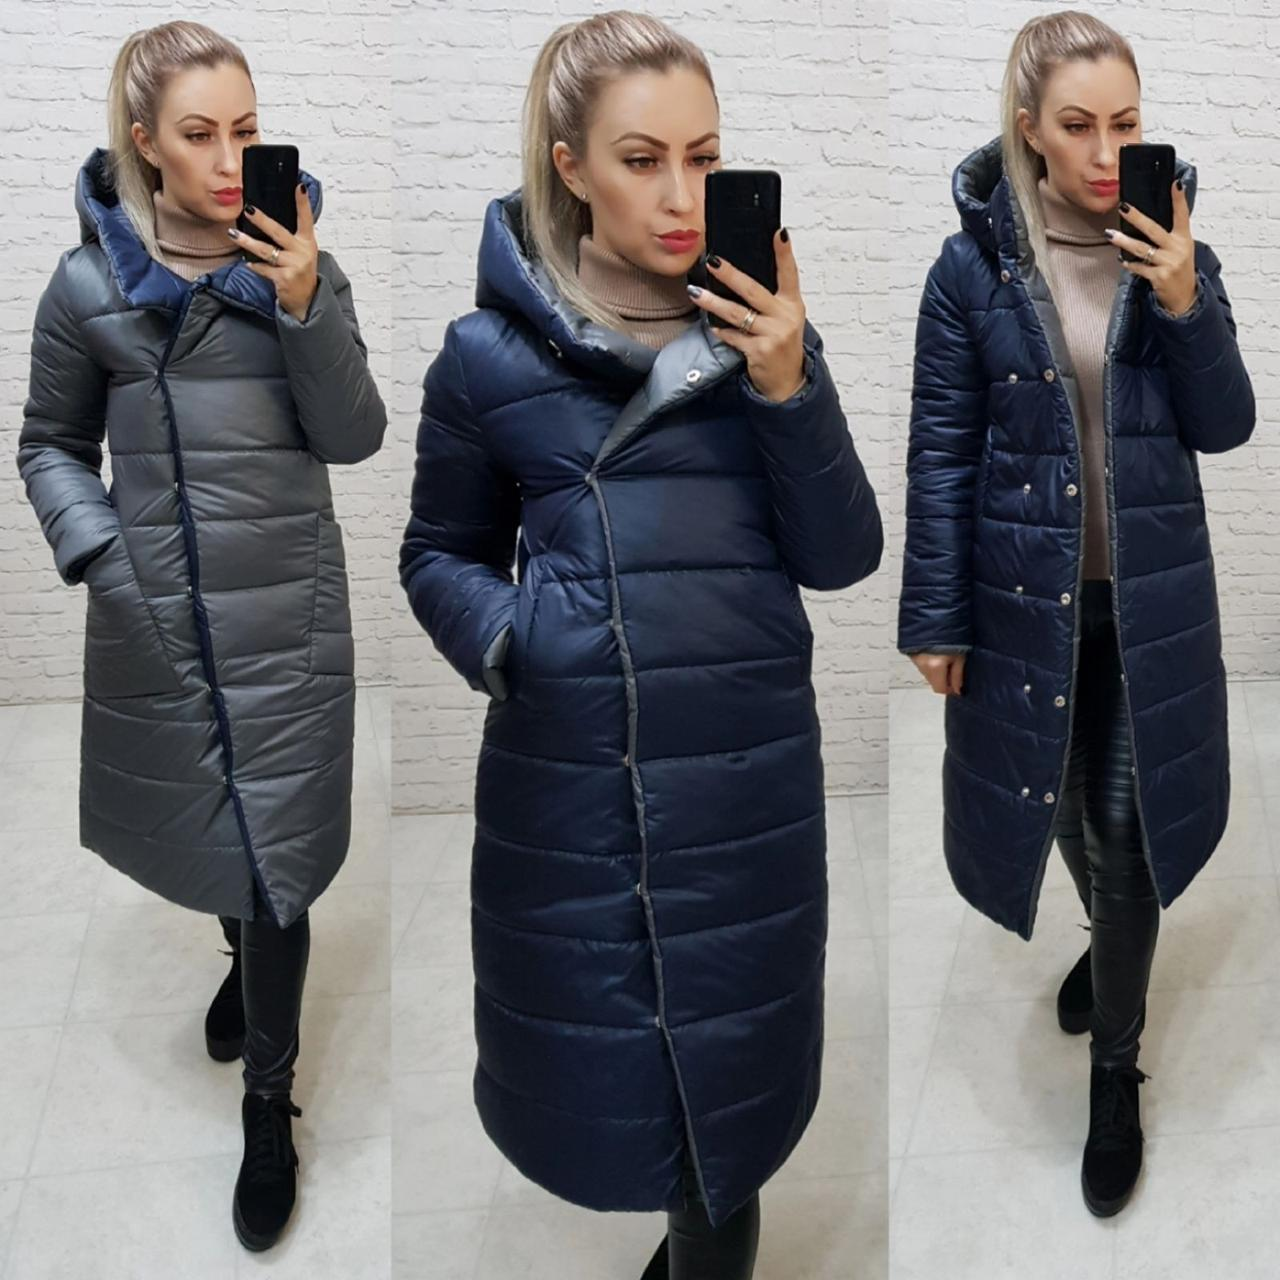 Куртка двустороняя евро-зима  с капюшоном арт. 1007 темно-синий/ серый 1007